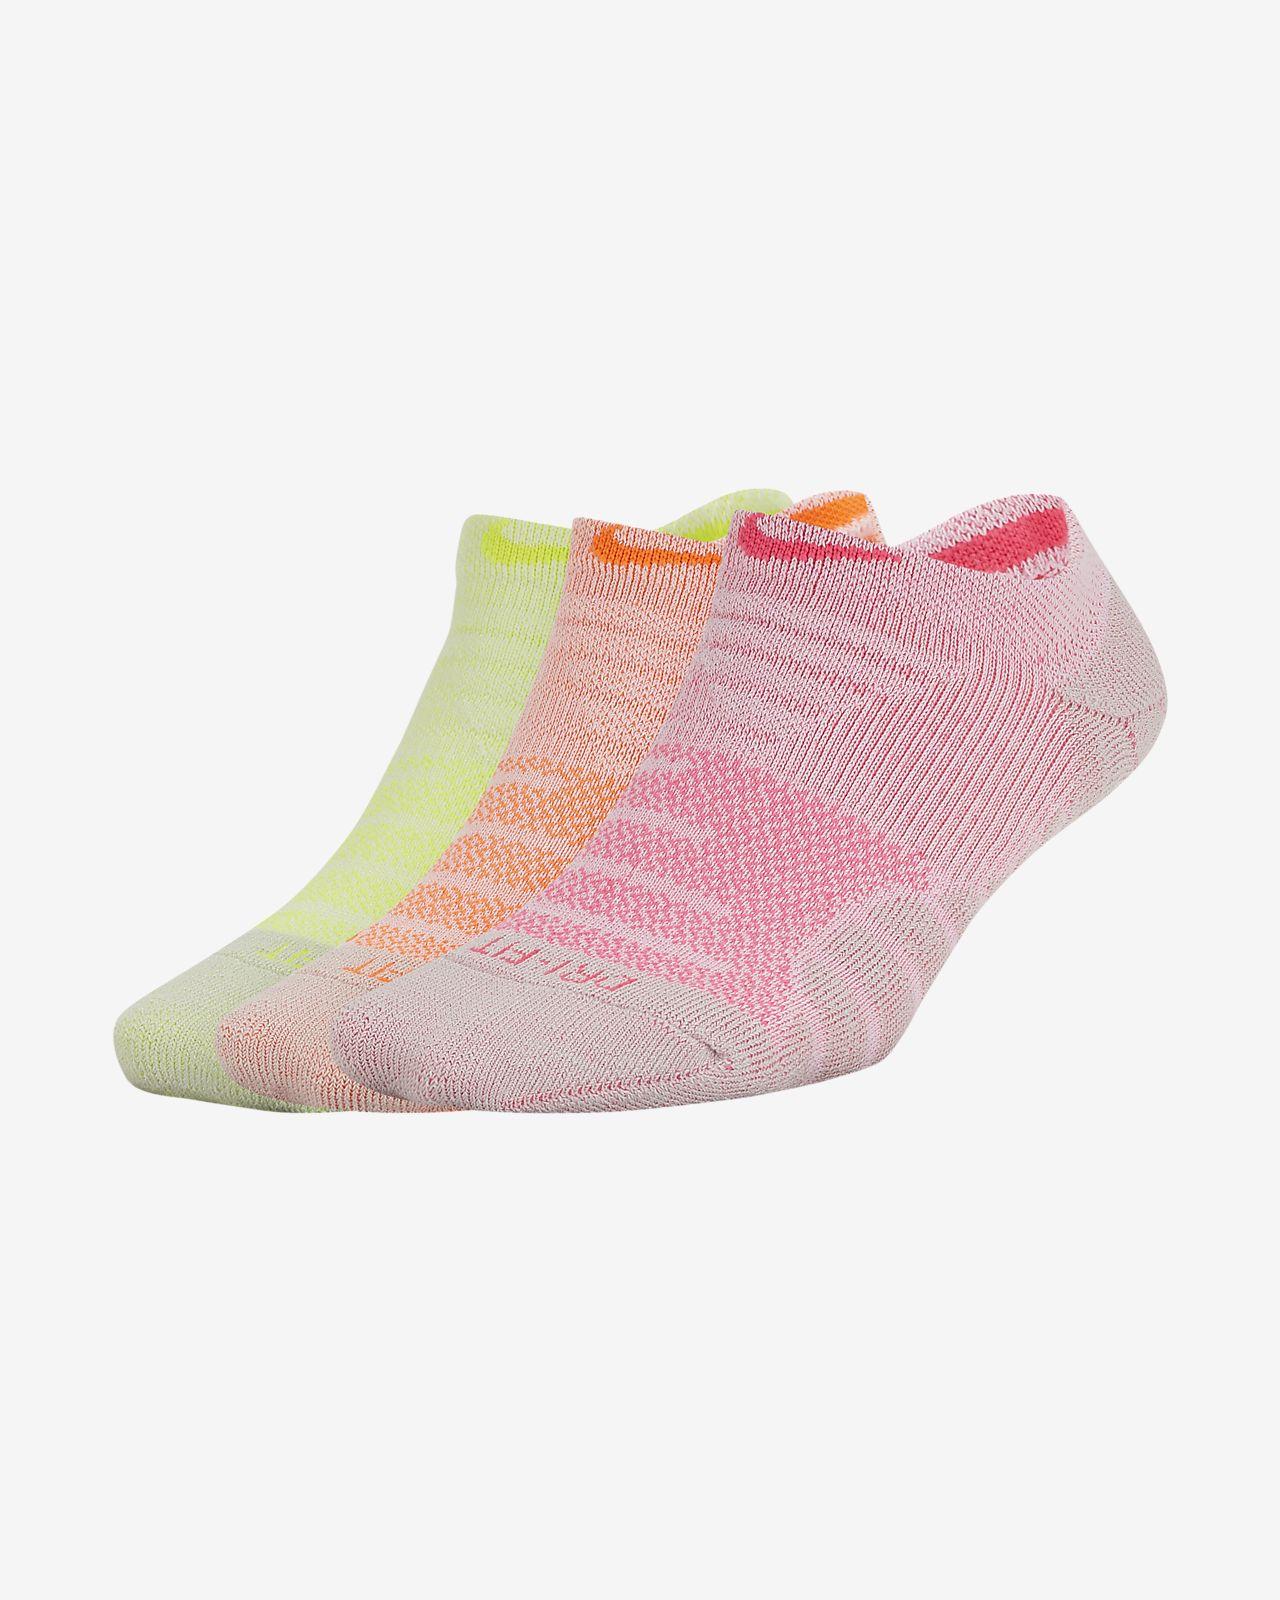 Nike Dry Cushion No-Show Training Socks (3 Pair)